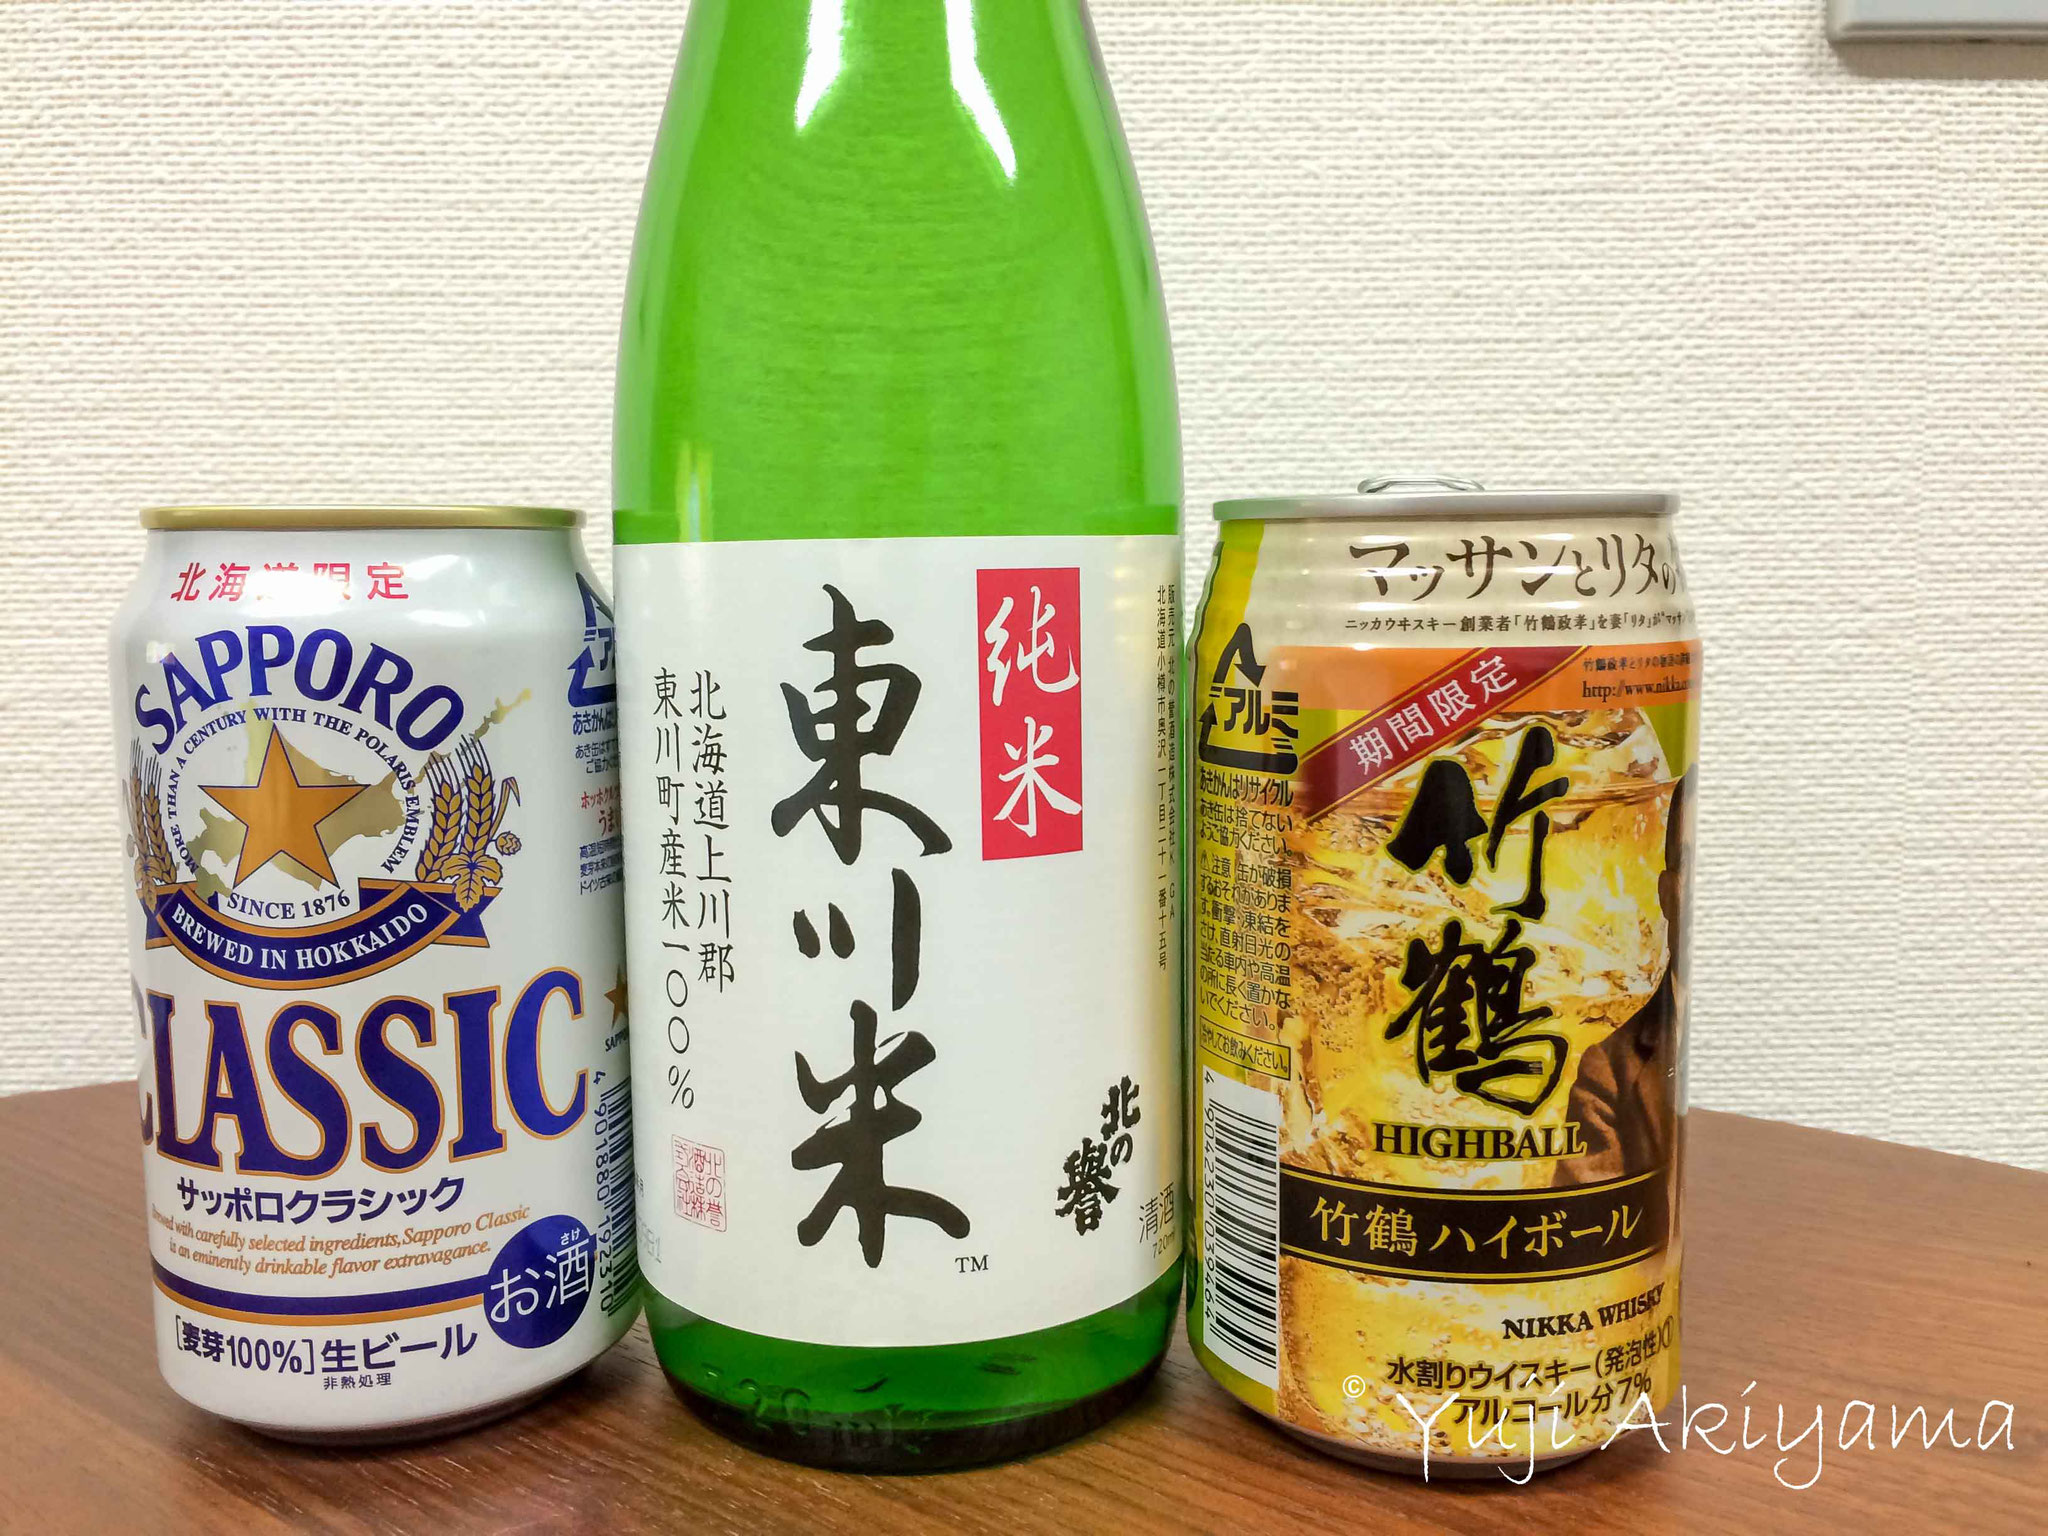 Hokkaido limited beer and sake